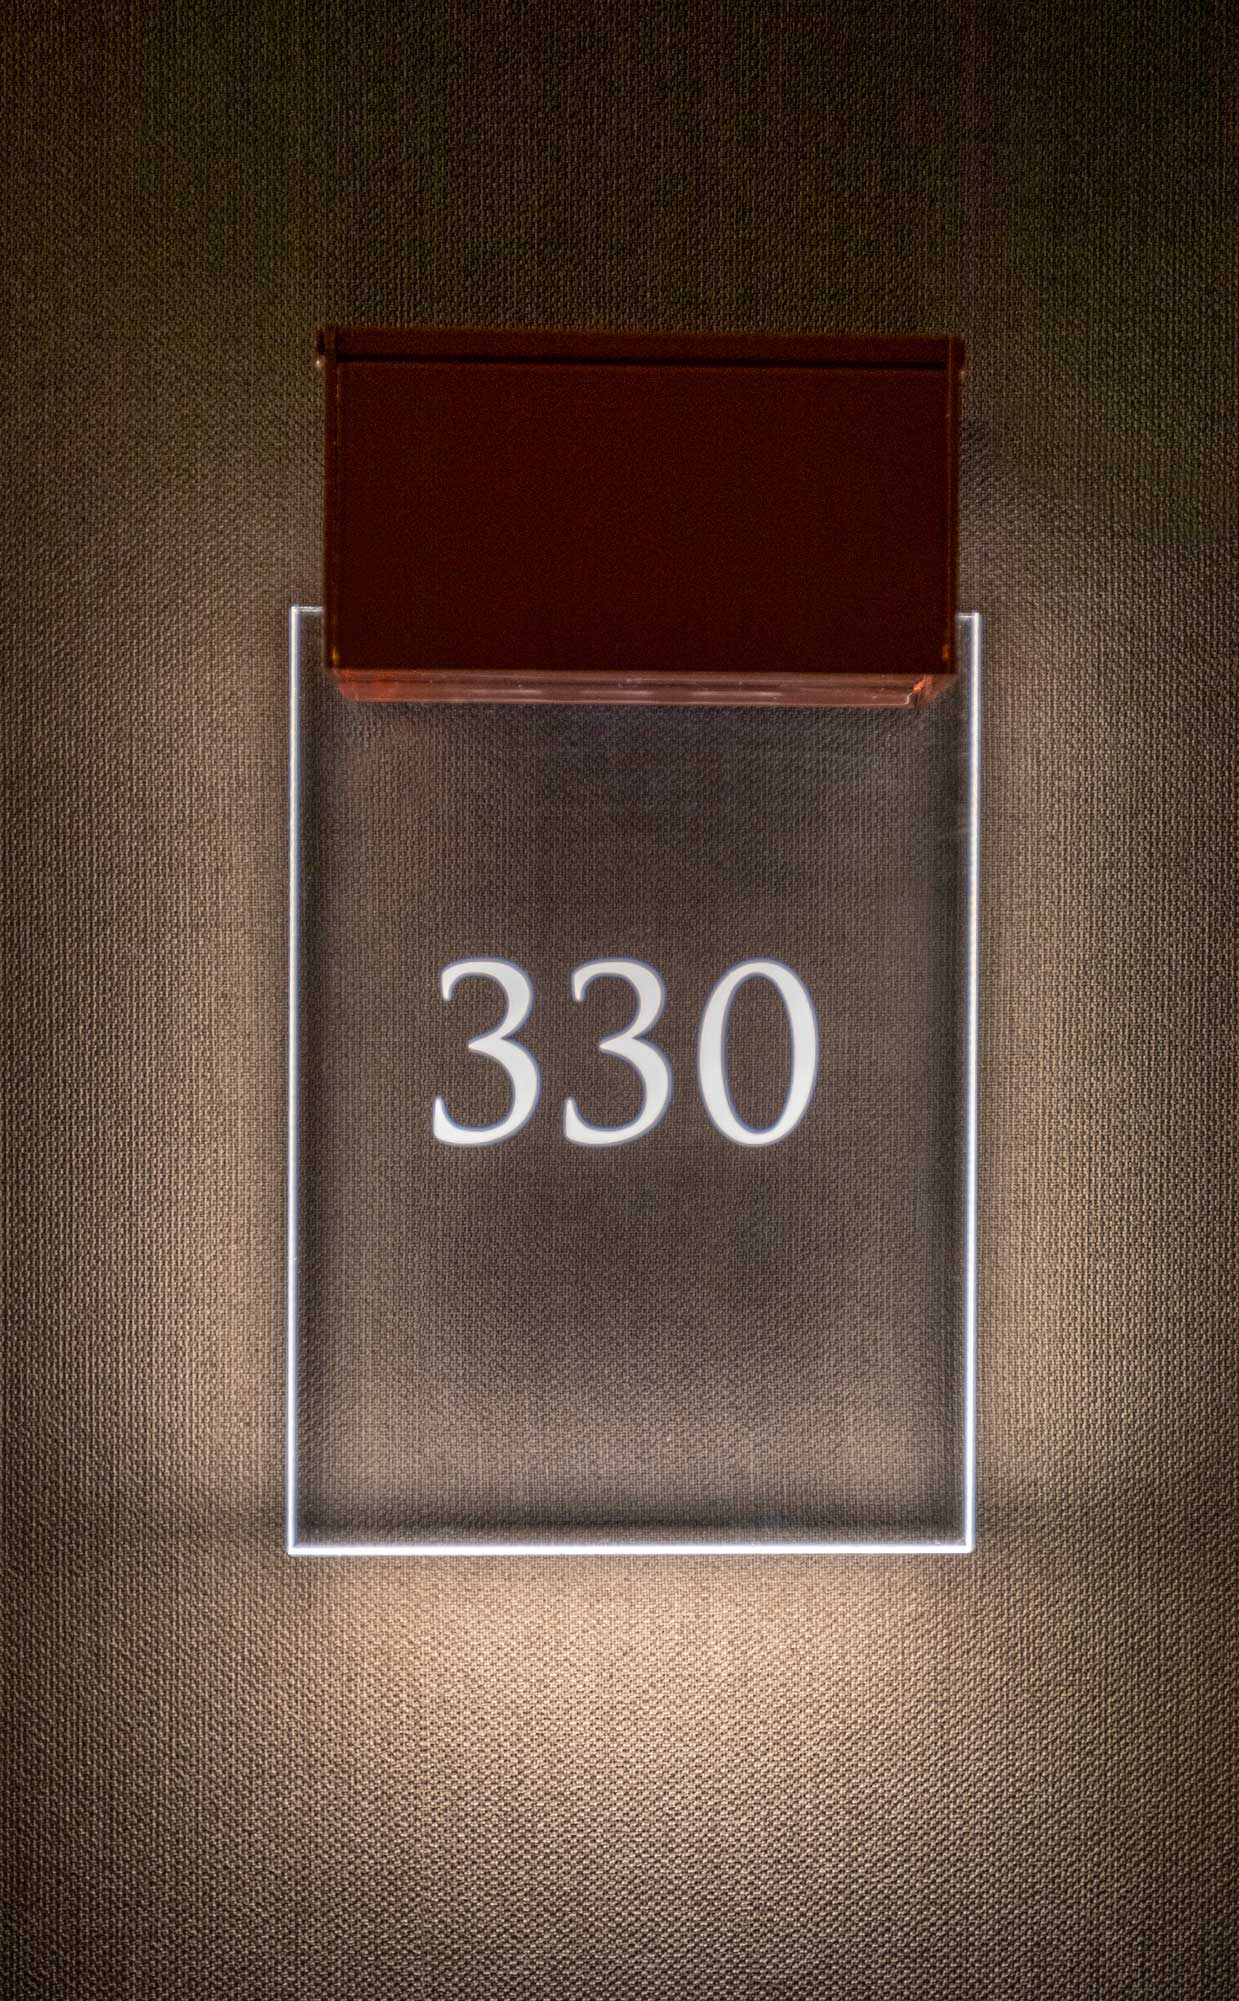 room-number-Belvedere-Hotel-Dublin